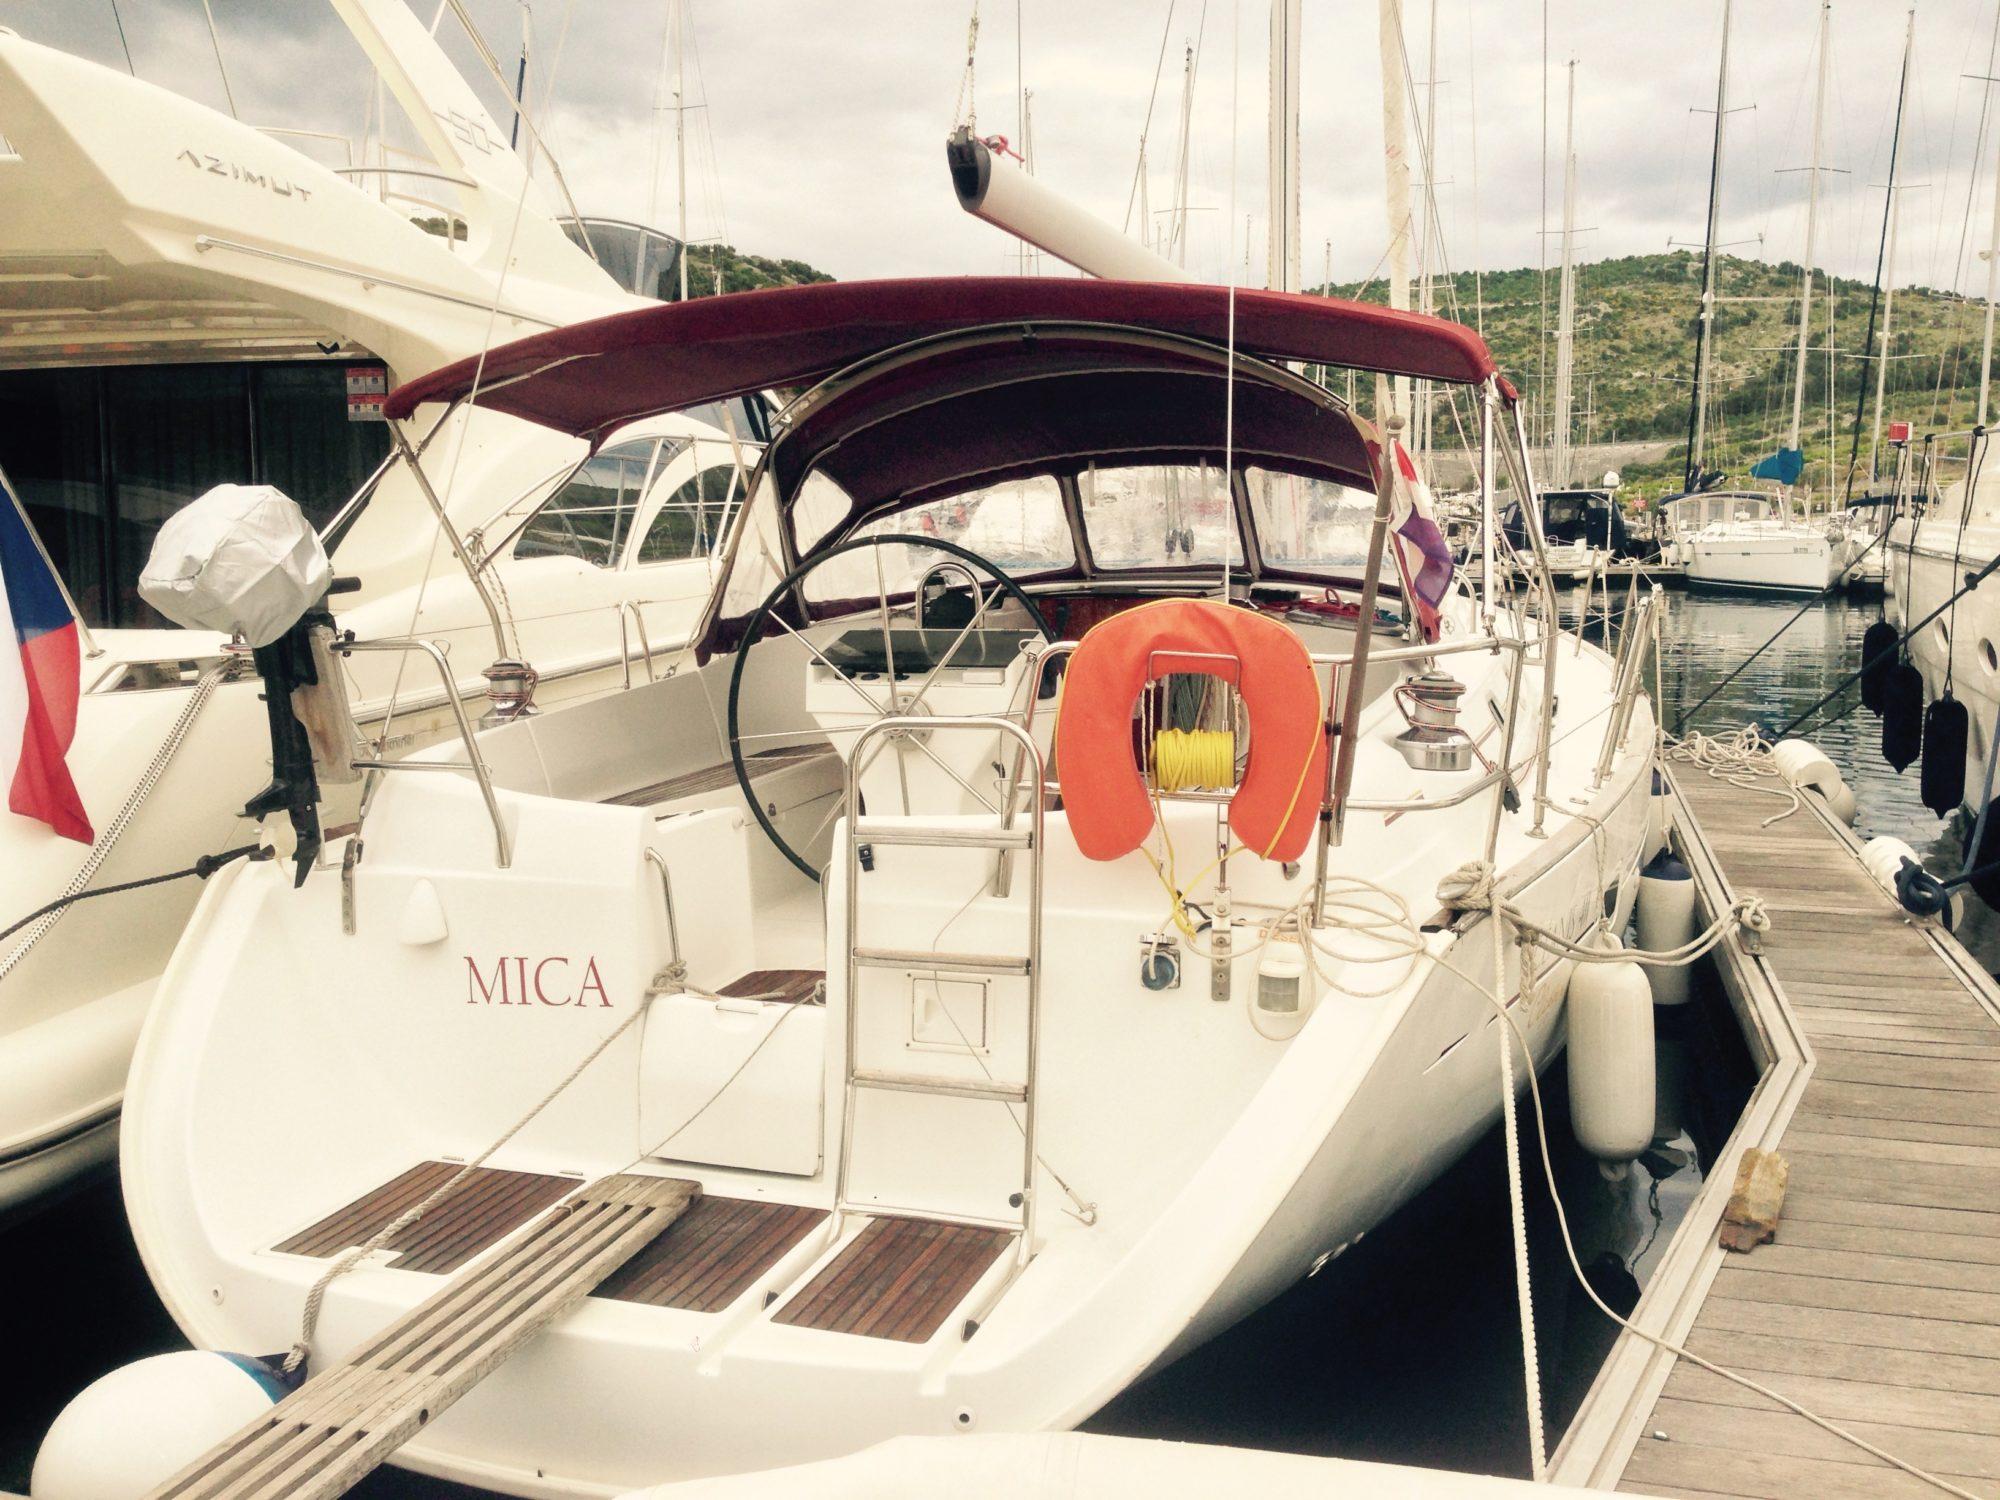 Oceanis-411-Mica-8